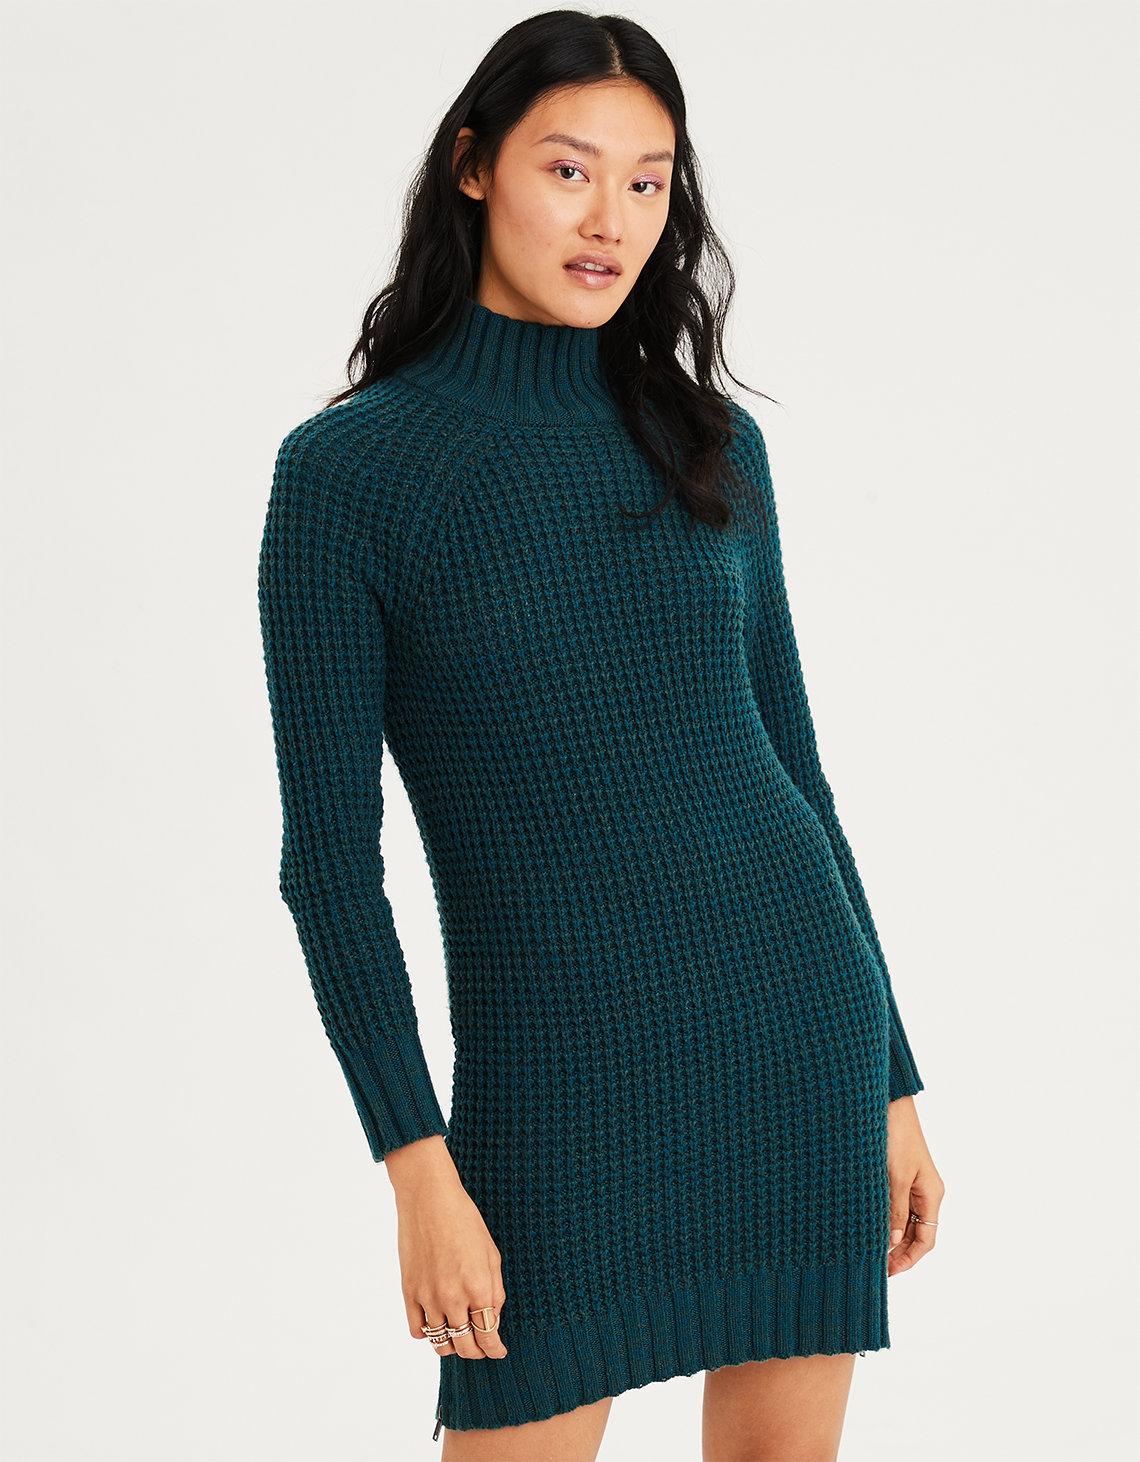 Fashion week Sweater Neck dress for girls